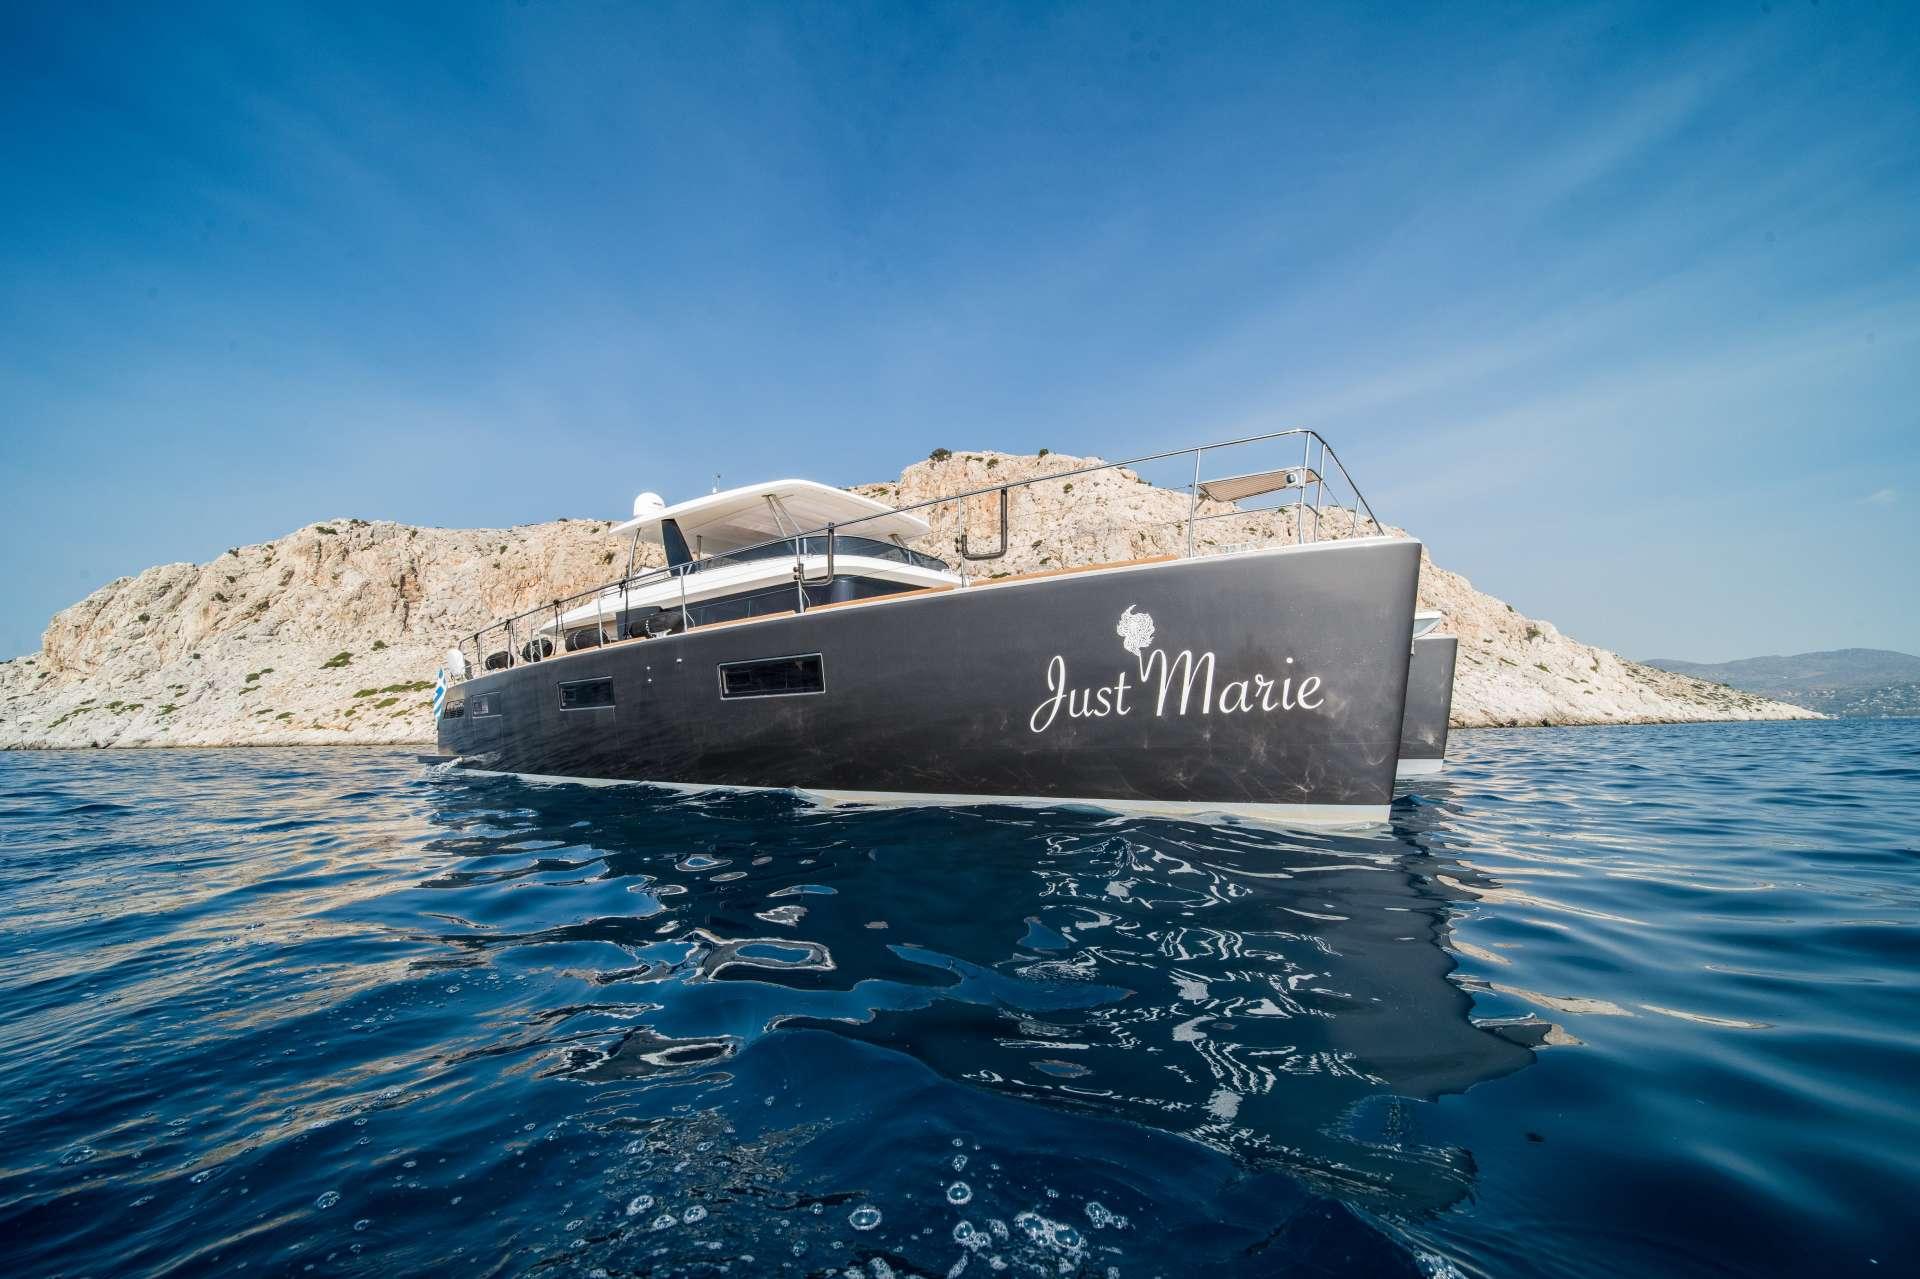 Cat Yacht 'Cat', 6 PAX, 3 Crew, 64.00 Ft, 19.00 Meters, Built 2019, Lagoon, Refit Year